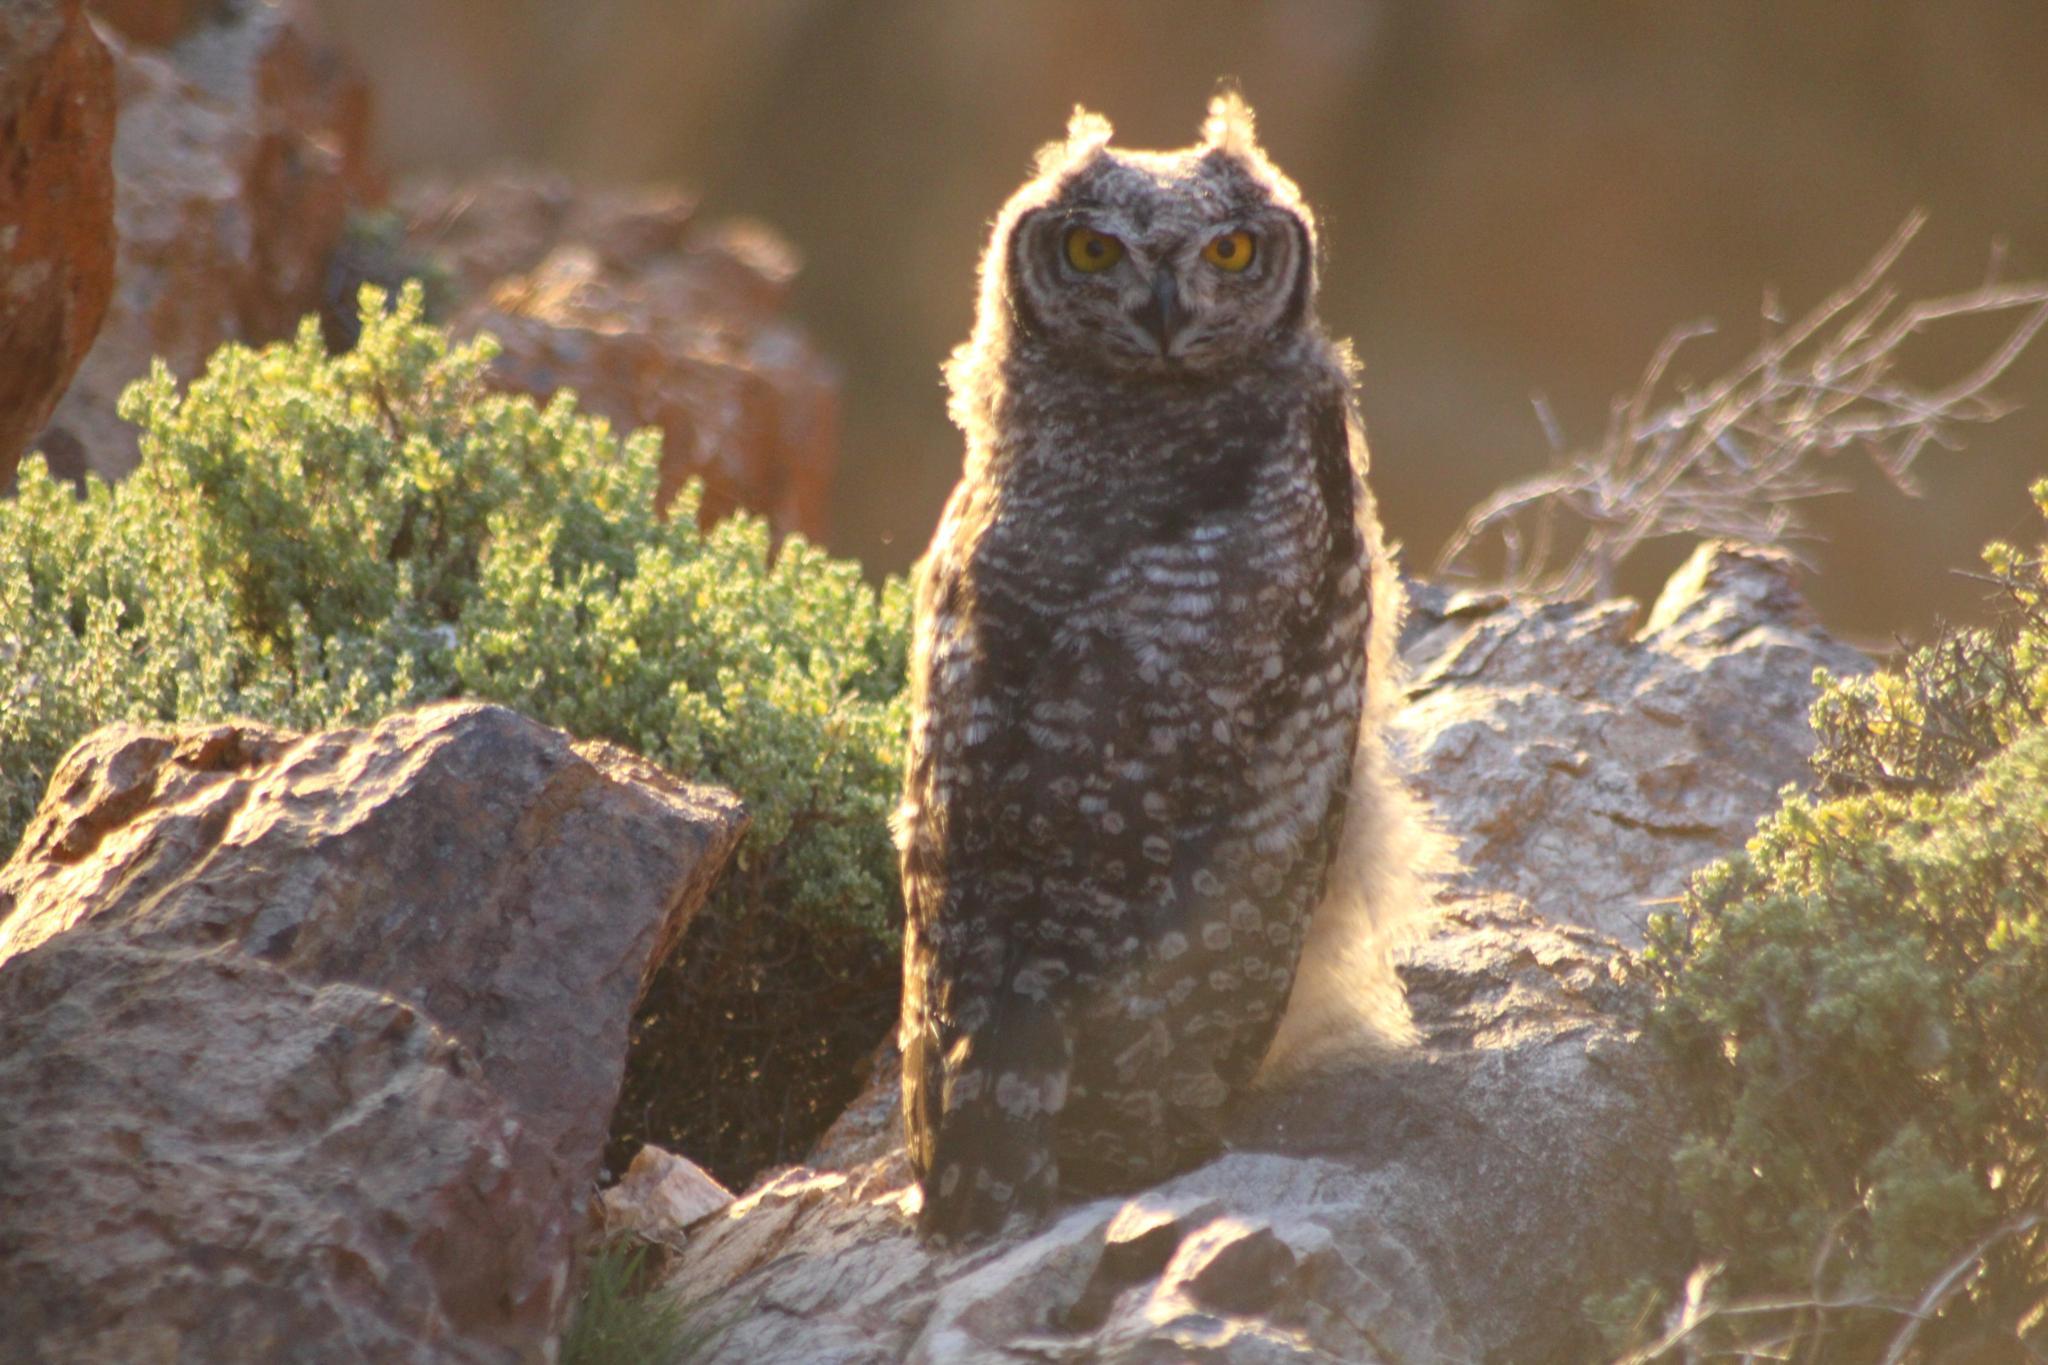 The Owl by Judithstopforth